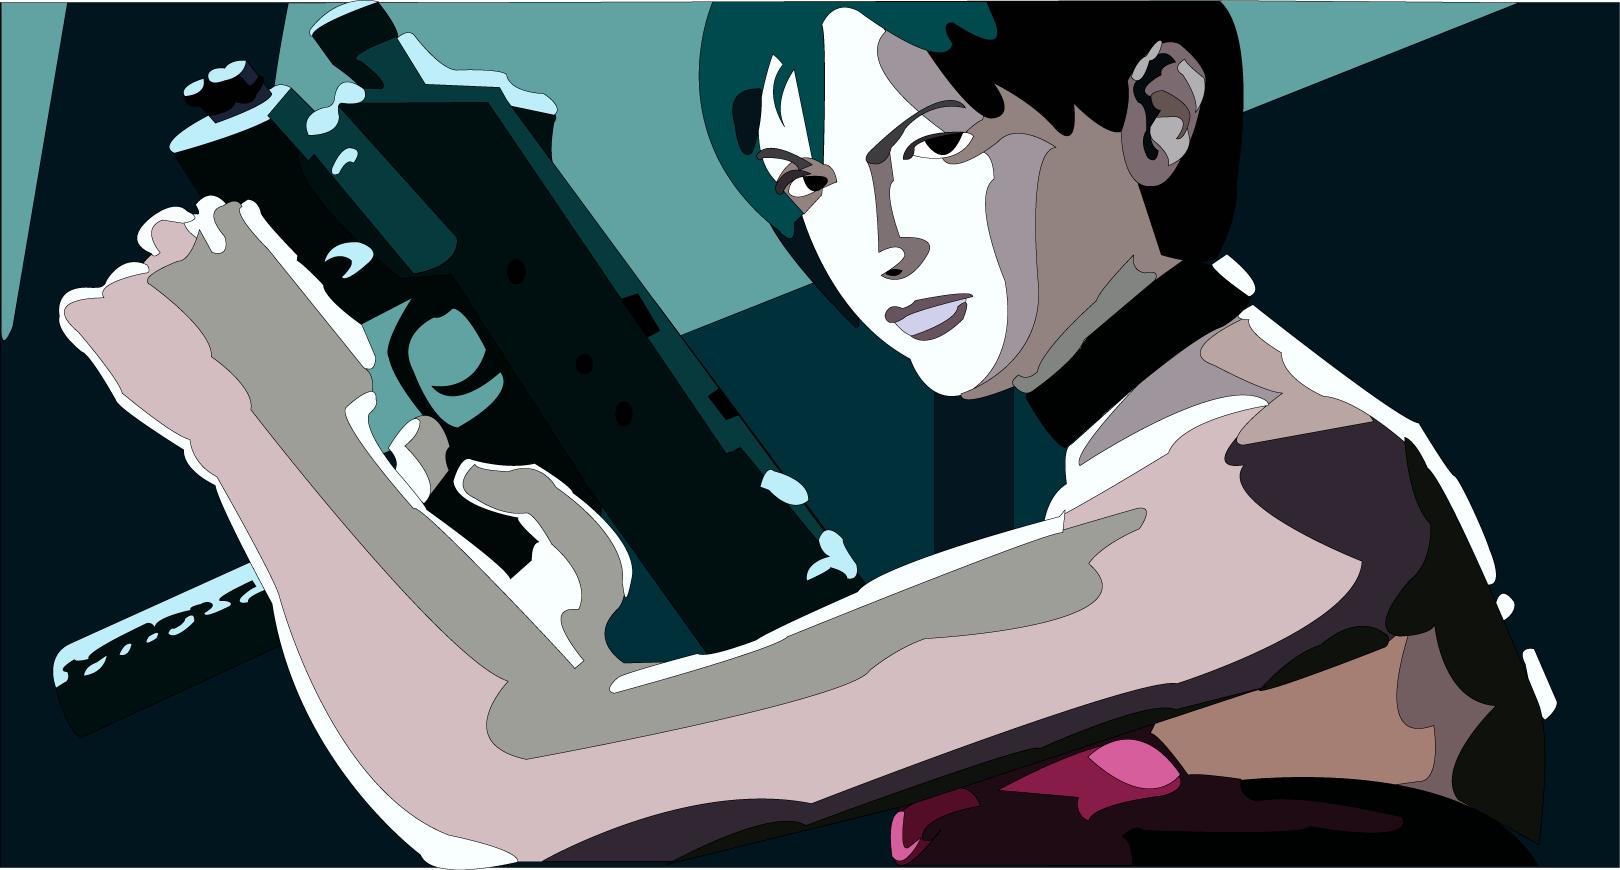 Resident Evil 4 by Mik4g